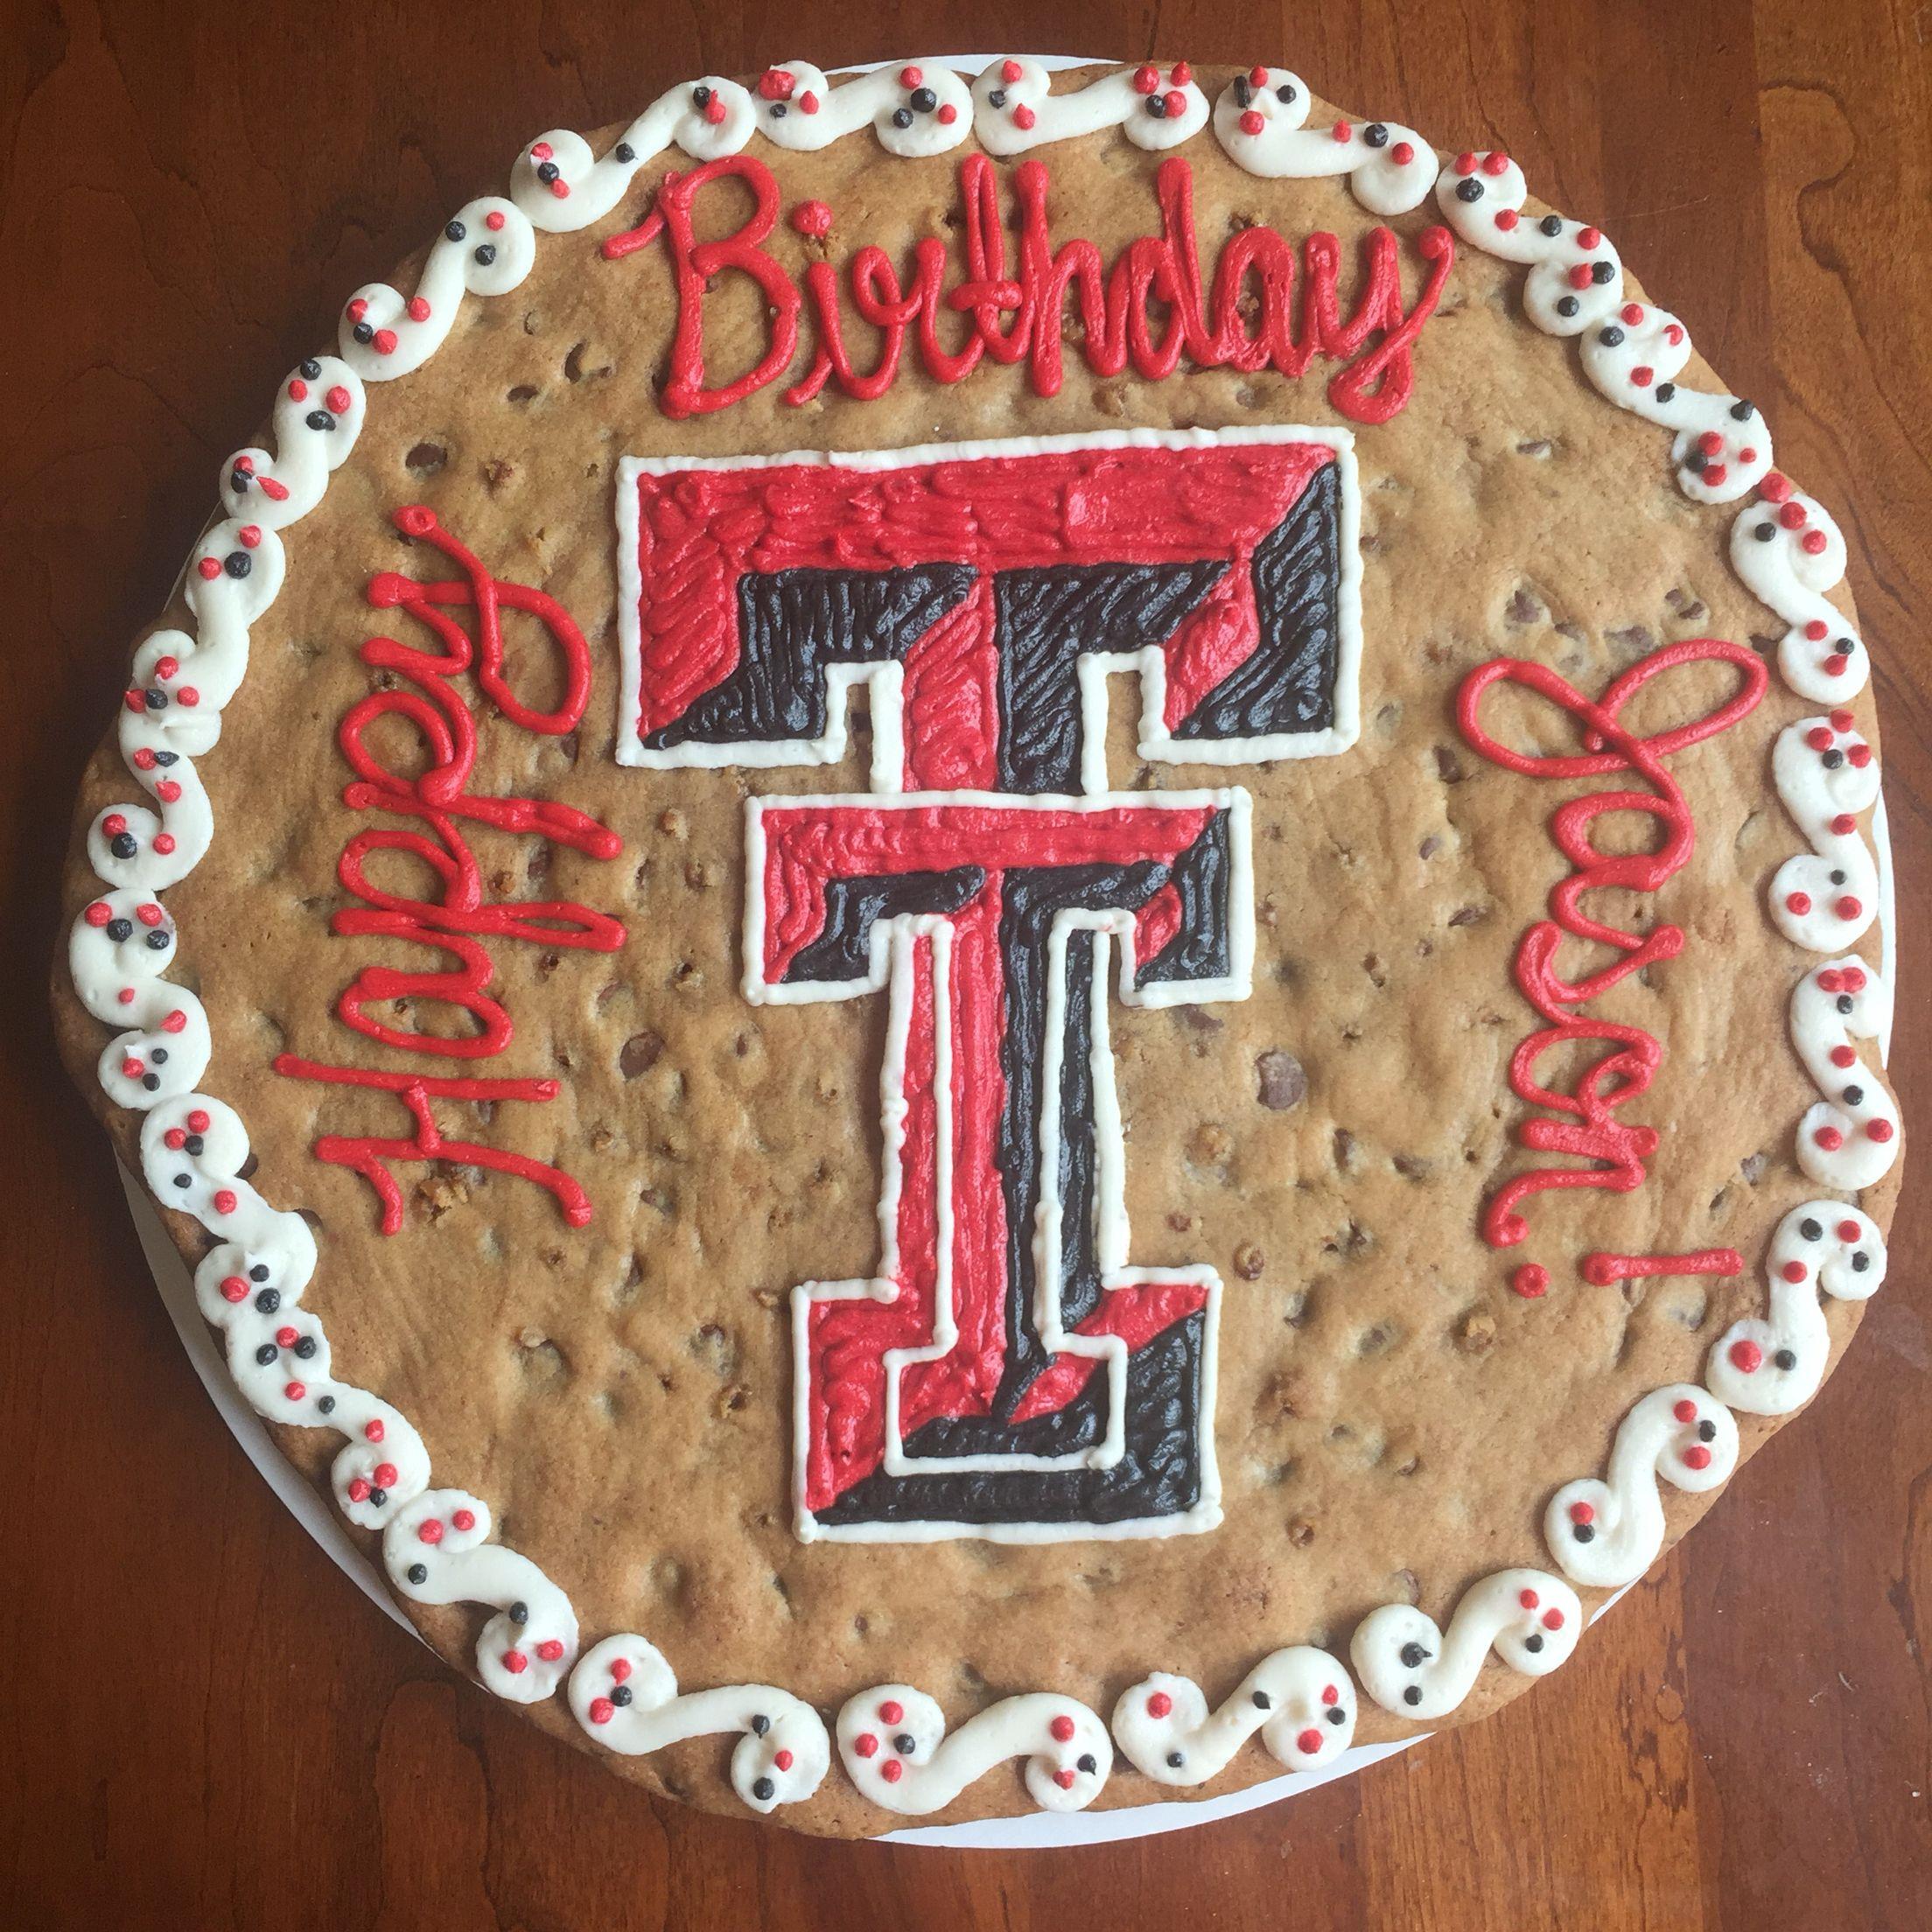 Texas Tech cookie cake!